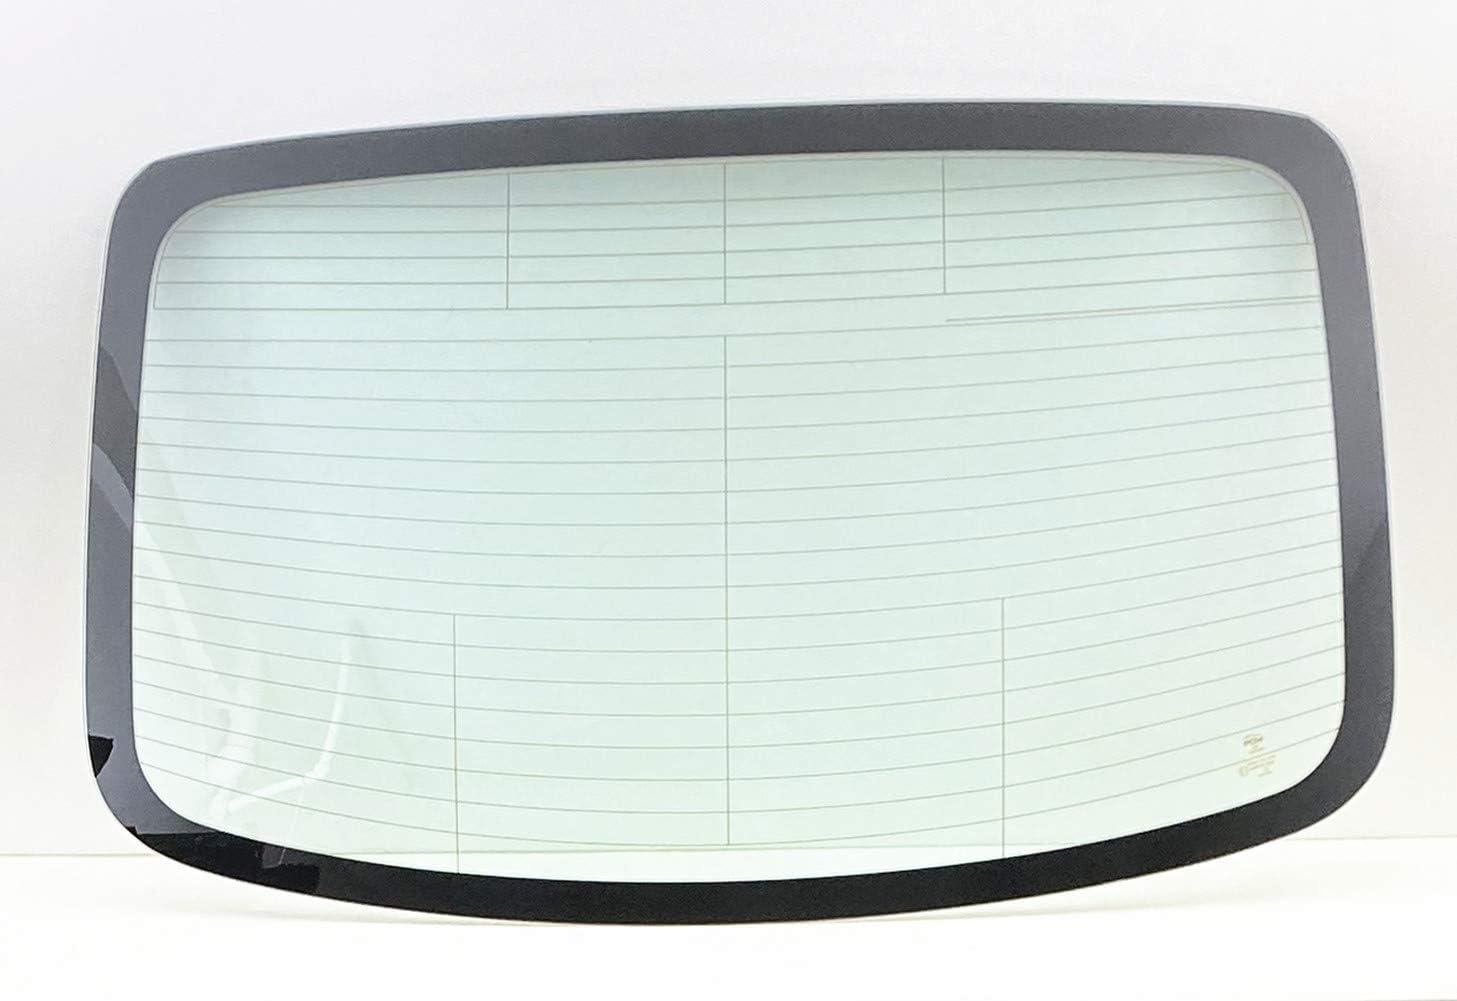 NAGD Heated Back Window Glass with Compatible Forte Kia 201 OFFicial shop Milwaukee Mall